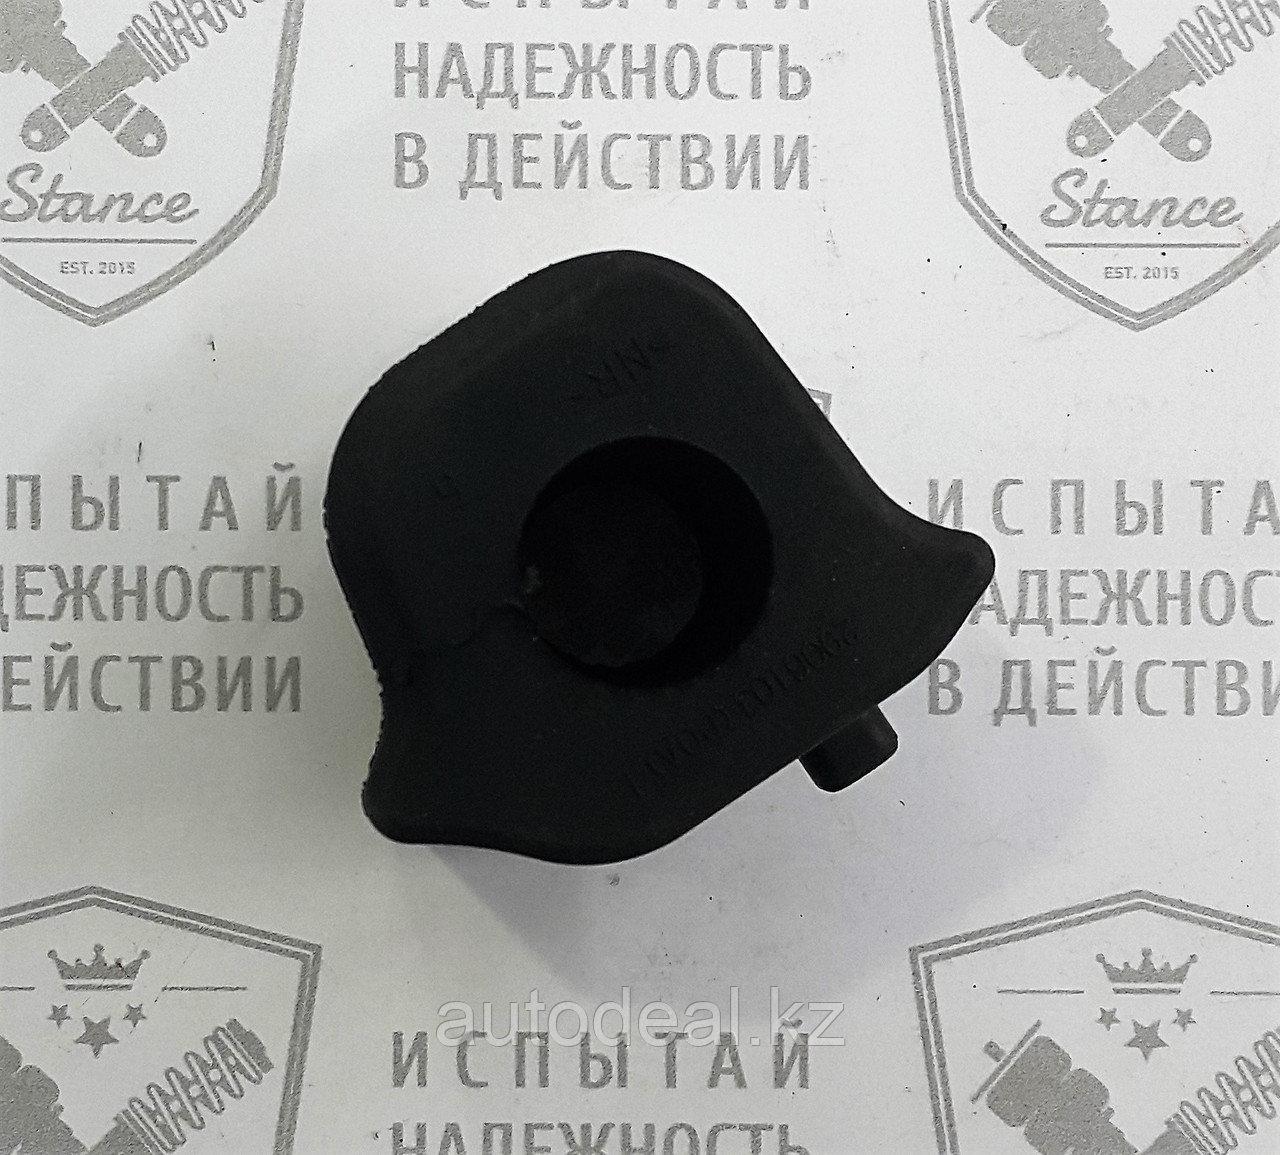 Втулка заднего стабилизатора Geely X7 / Rear stabiliser bushing